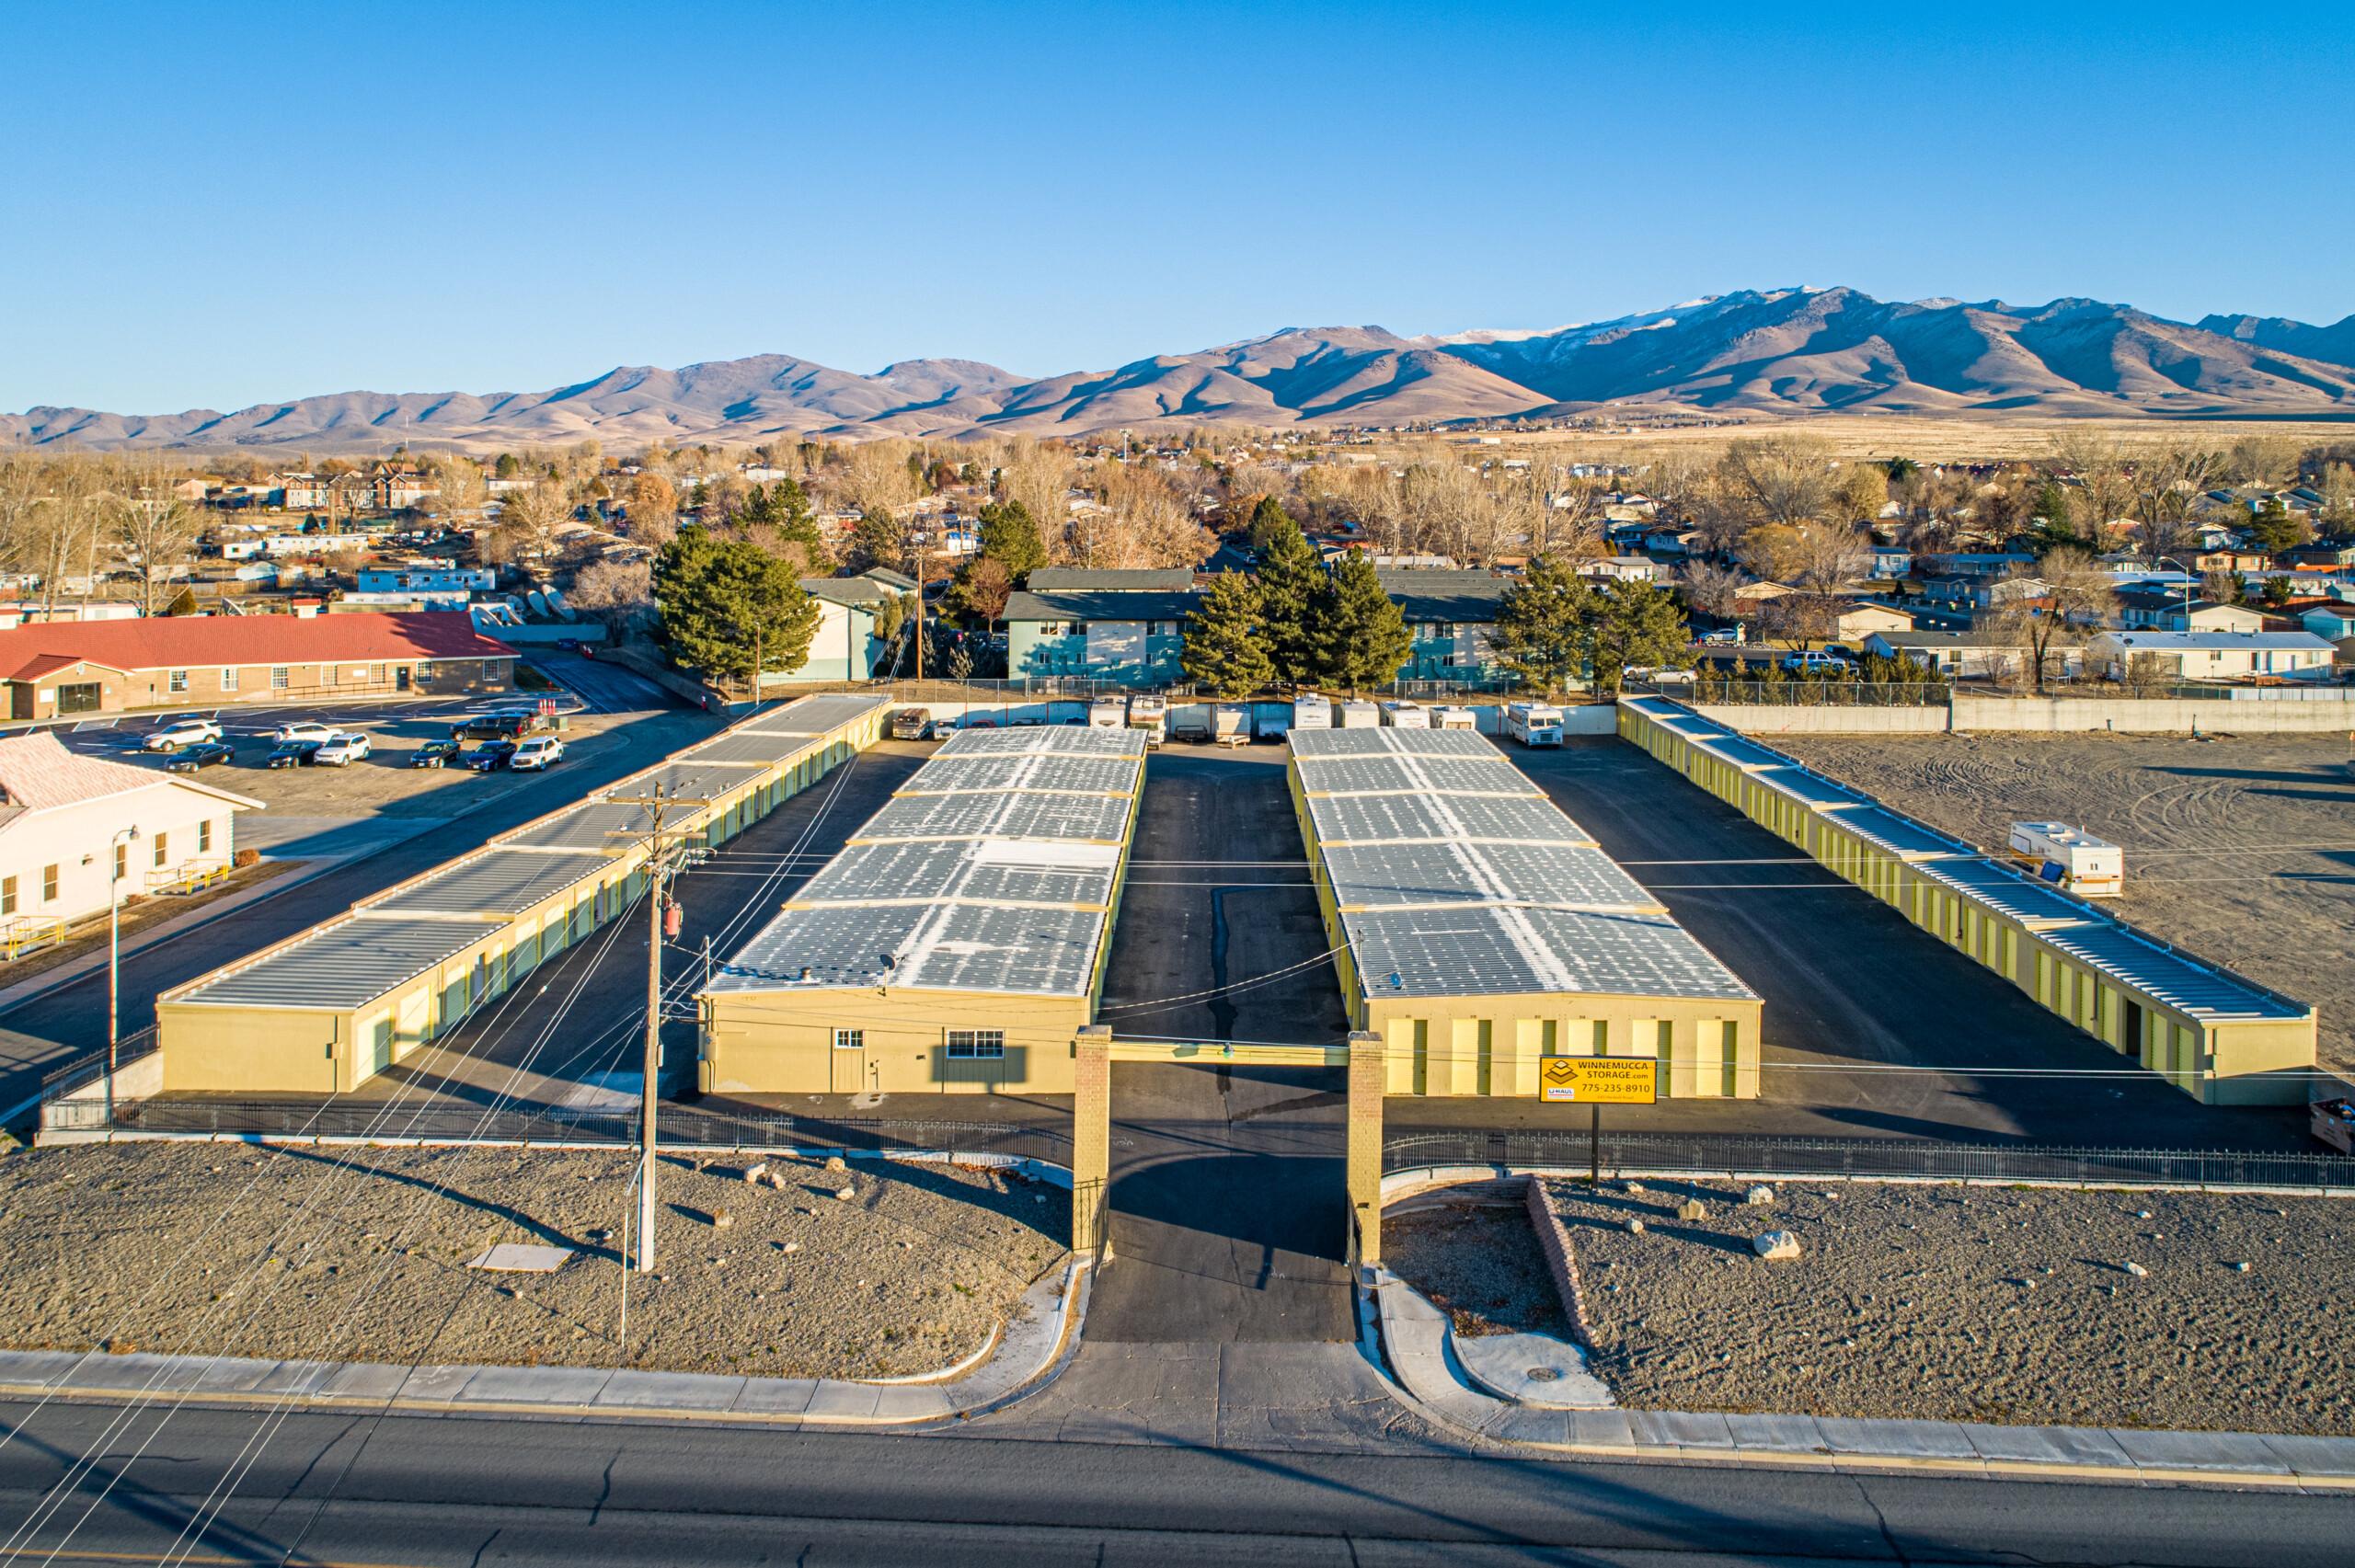 The Gorden Group Announces Sale of Winnemucca Storage in Winnemucca, Nevada.